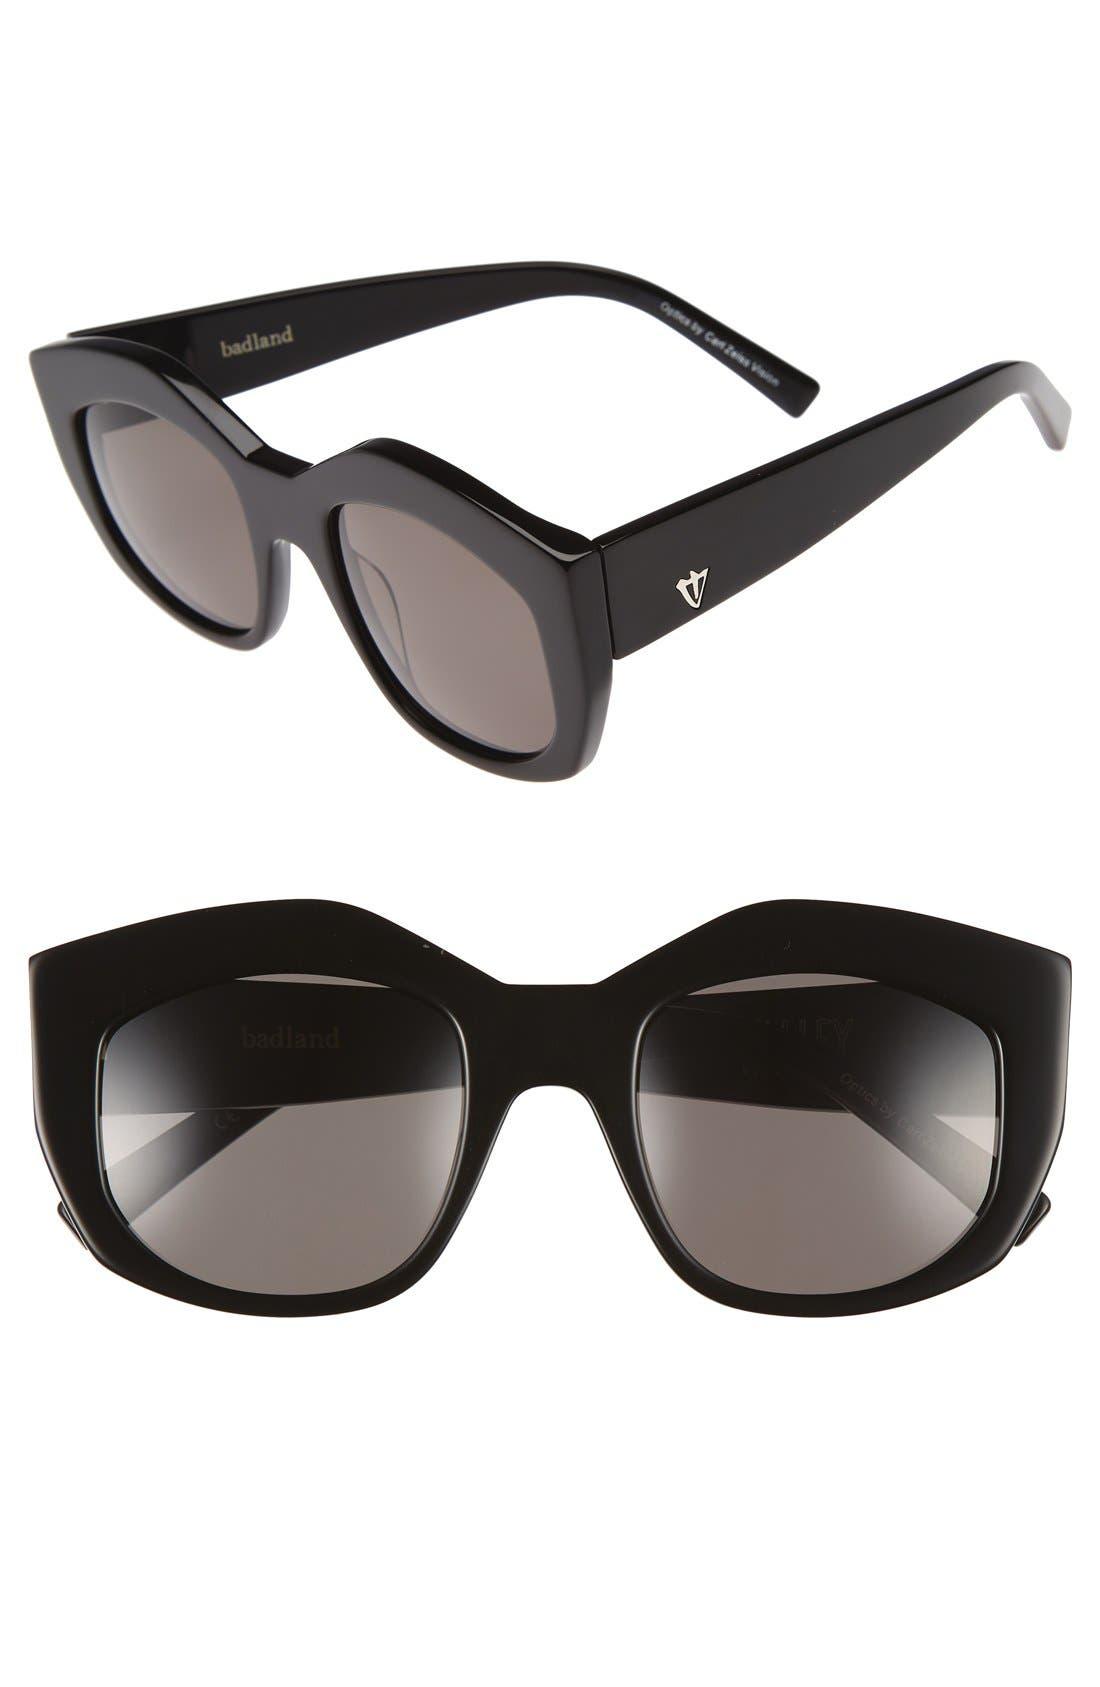 50mm Badland Sunglasses,                         Main,                         color, Gloss Black